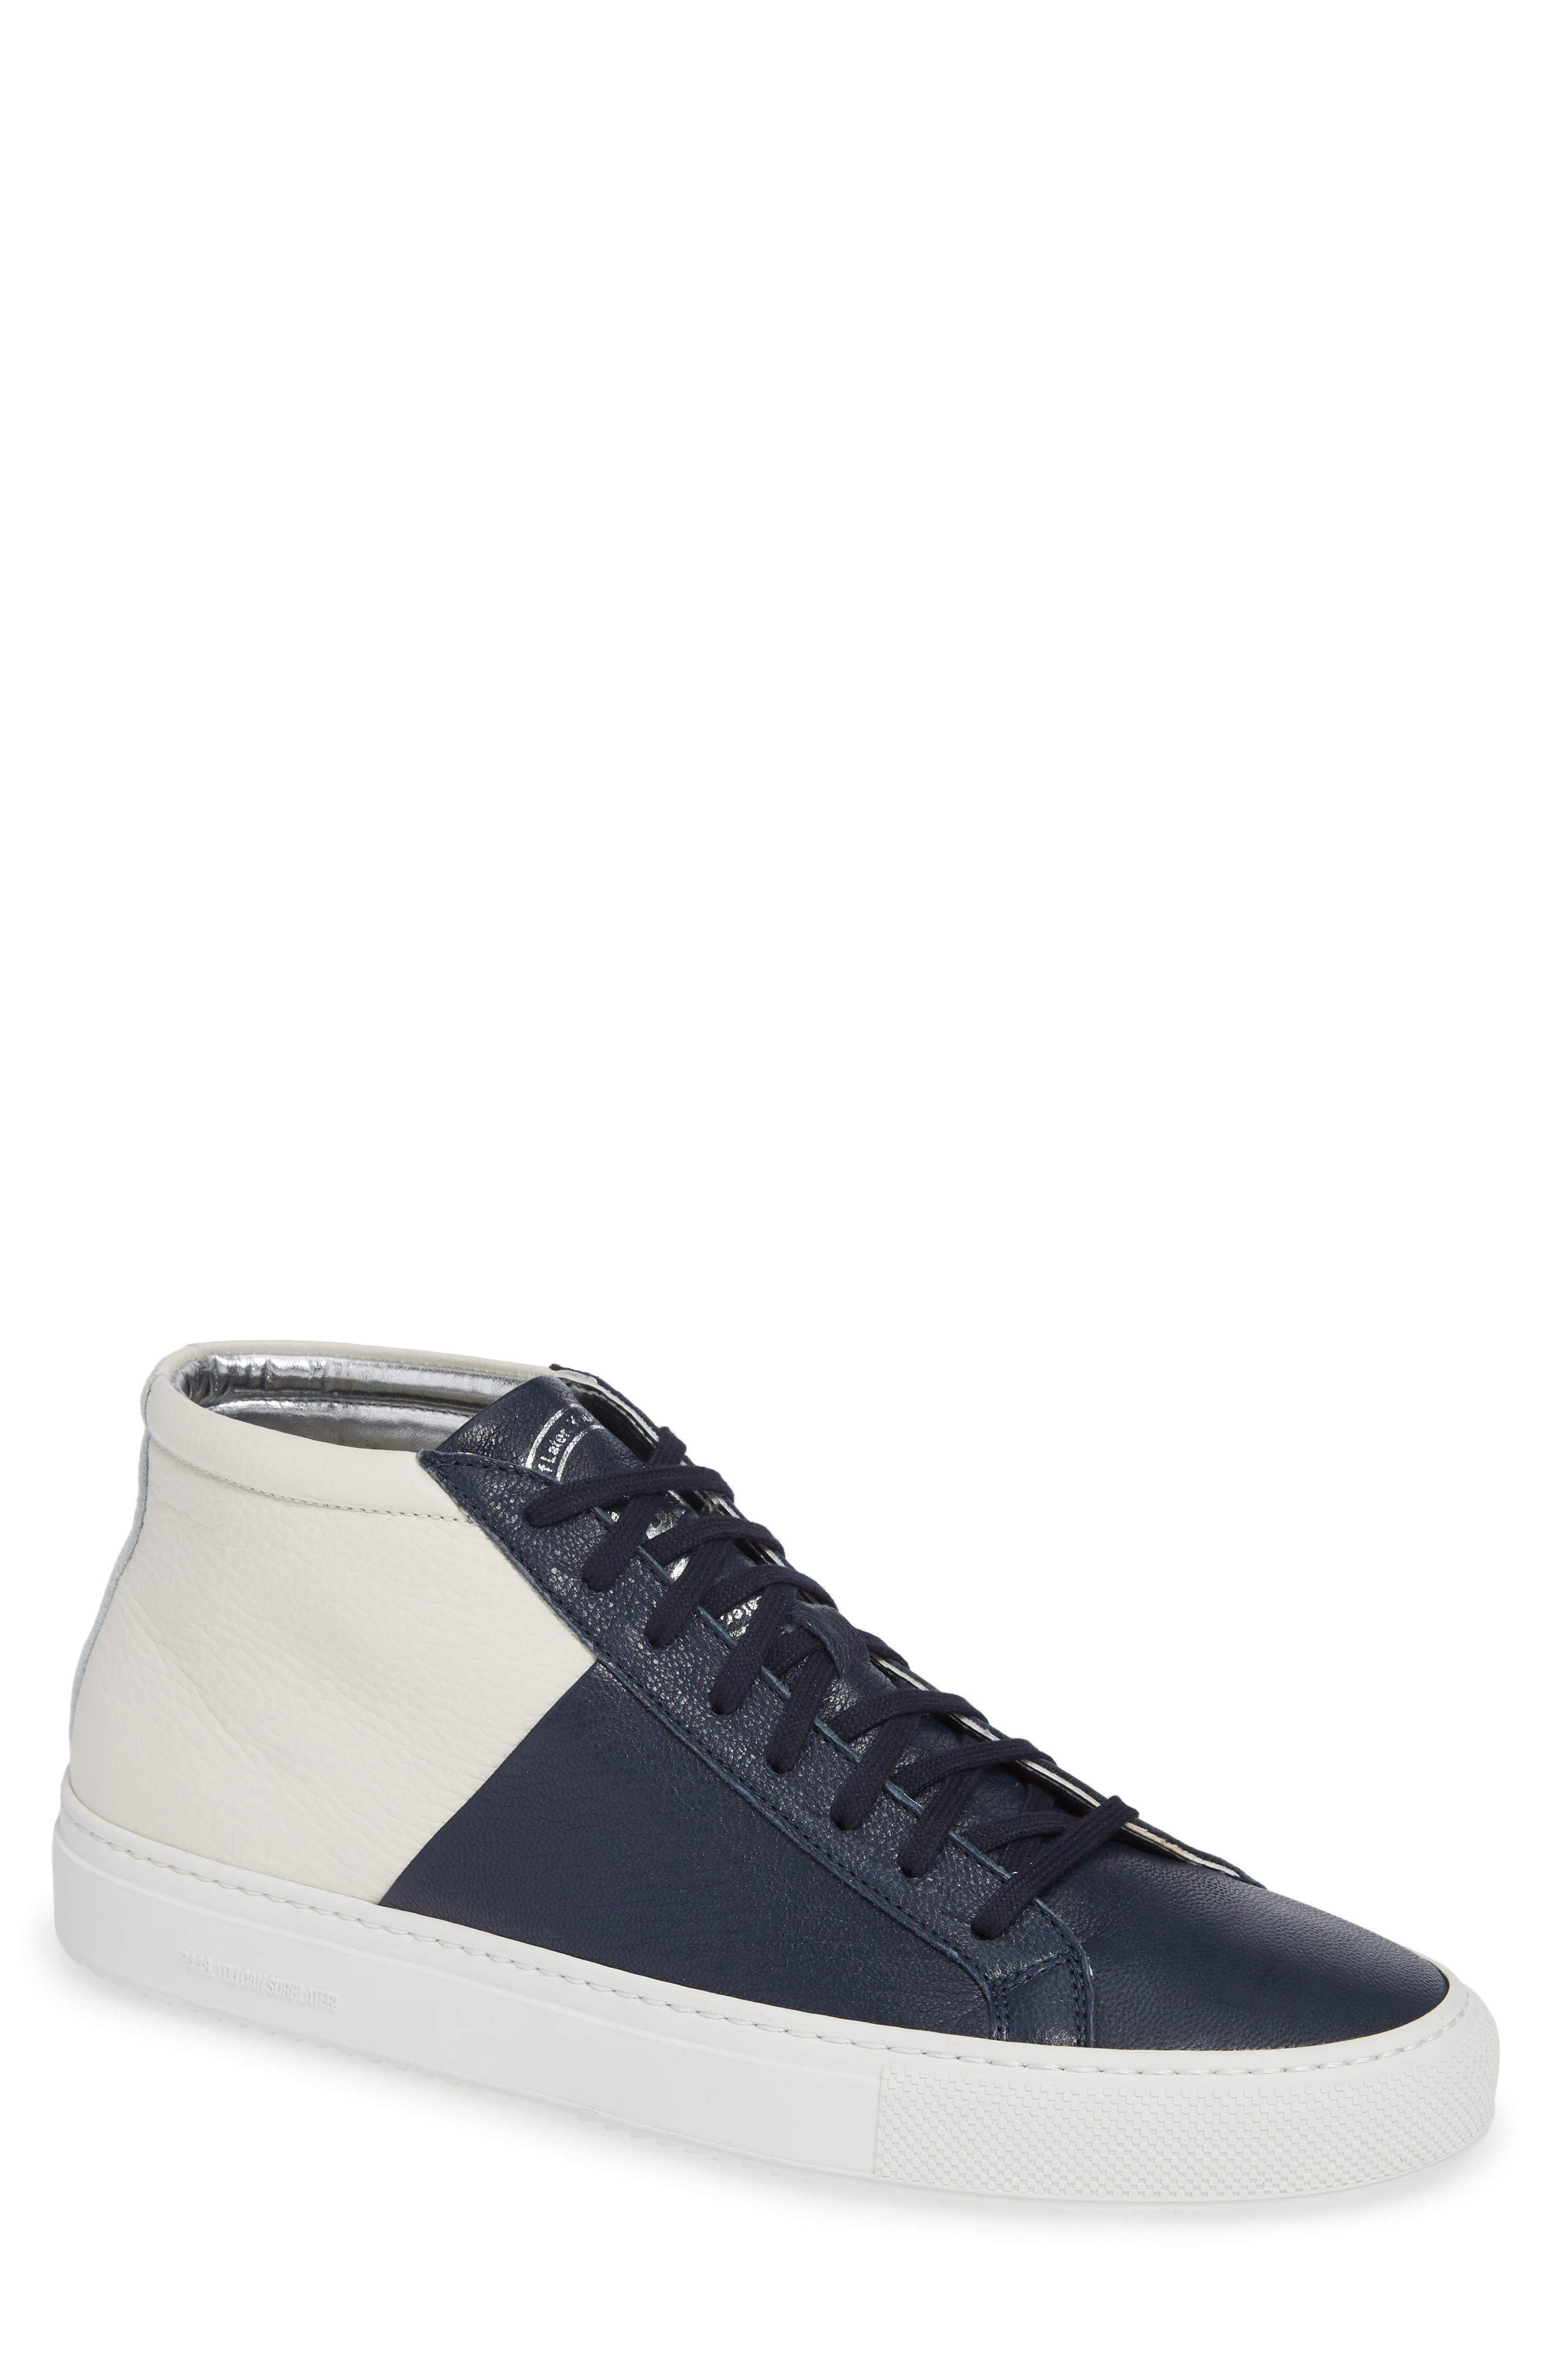 Eleven C Sneaker,                         Main,                         color, NAVY